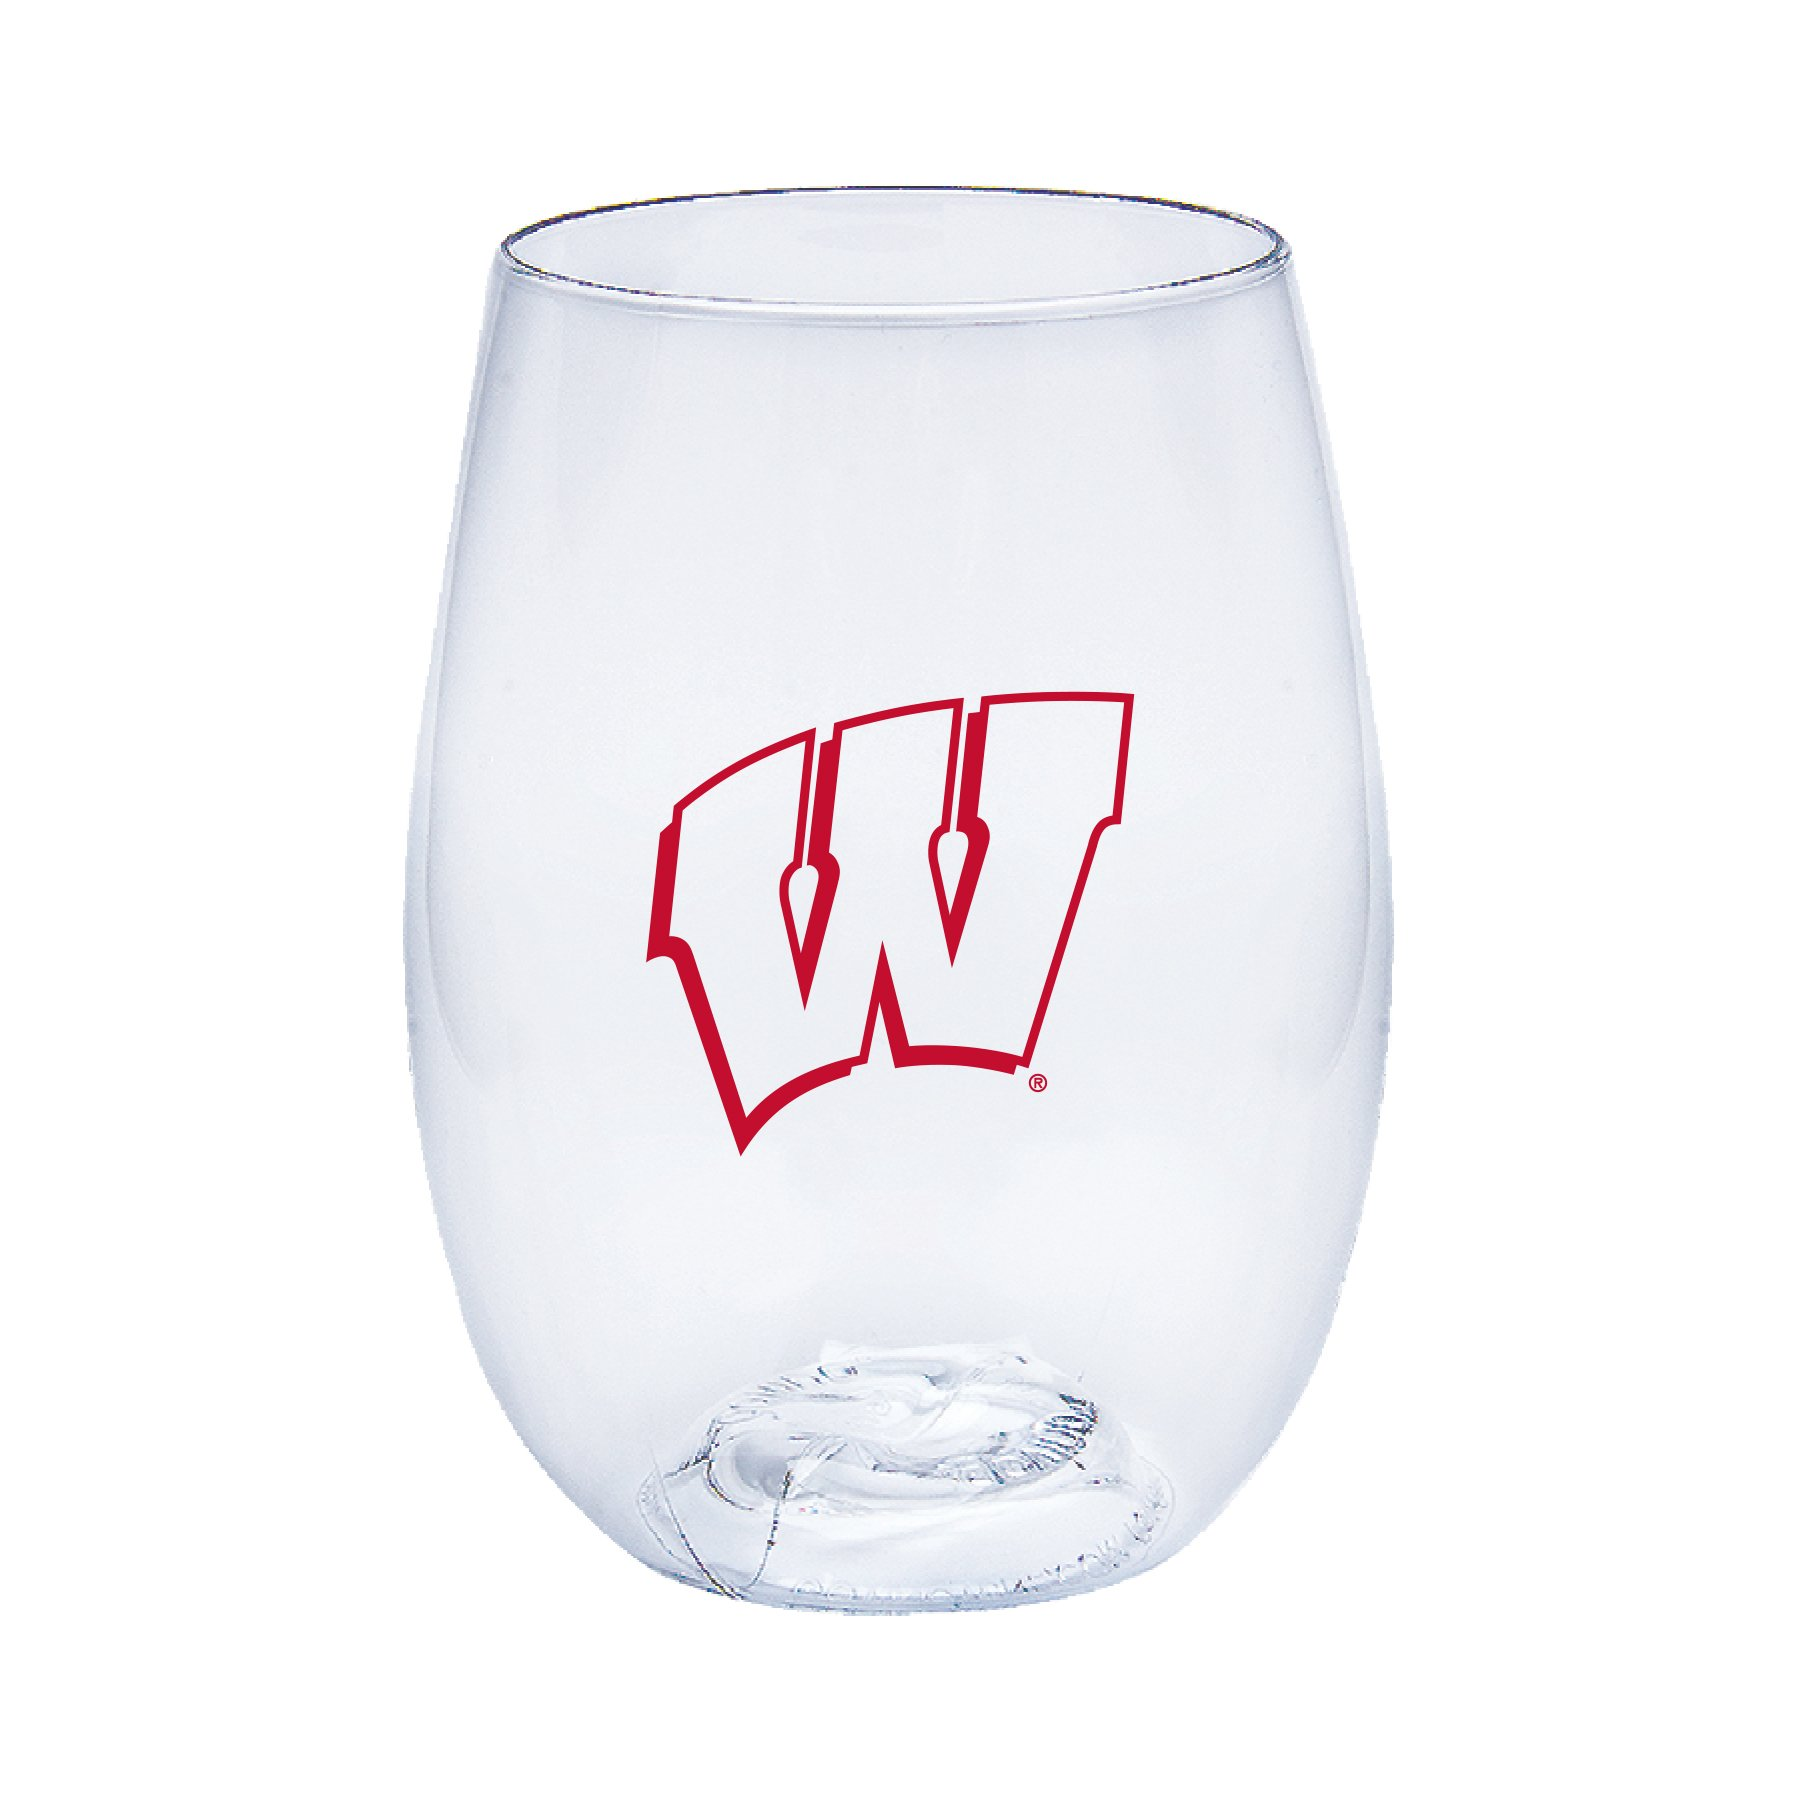 Neil Varsity Wisconsin Badgers Govino Shatterproof Wine or Beverage Glass